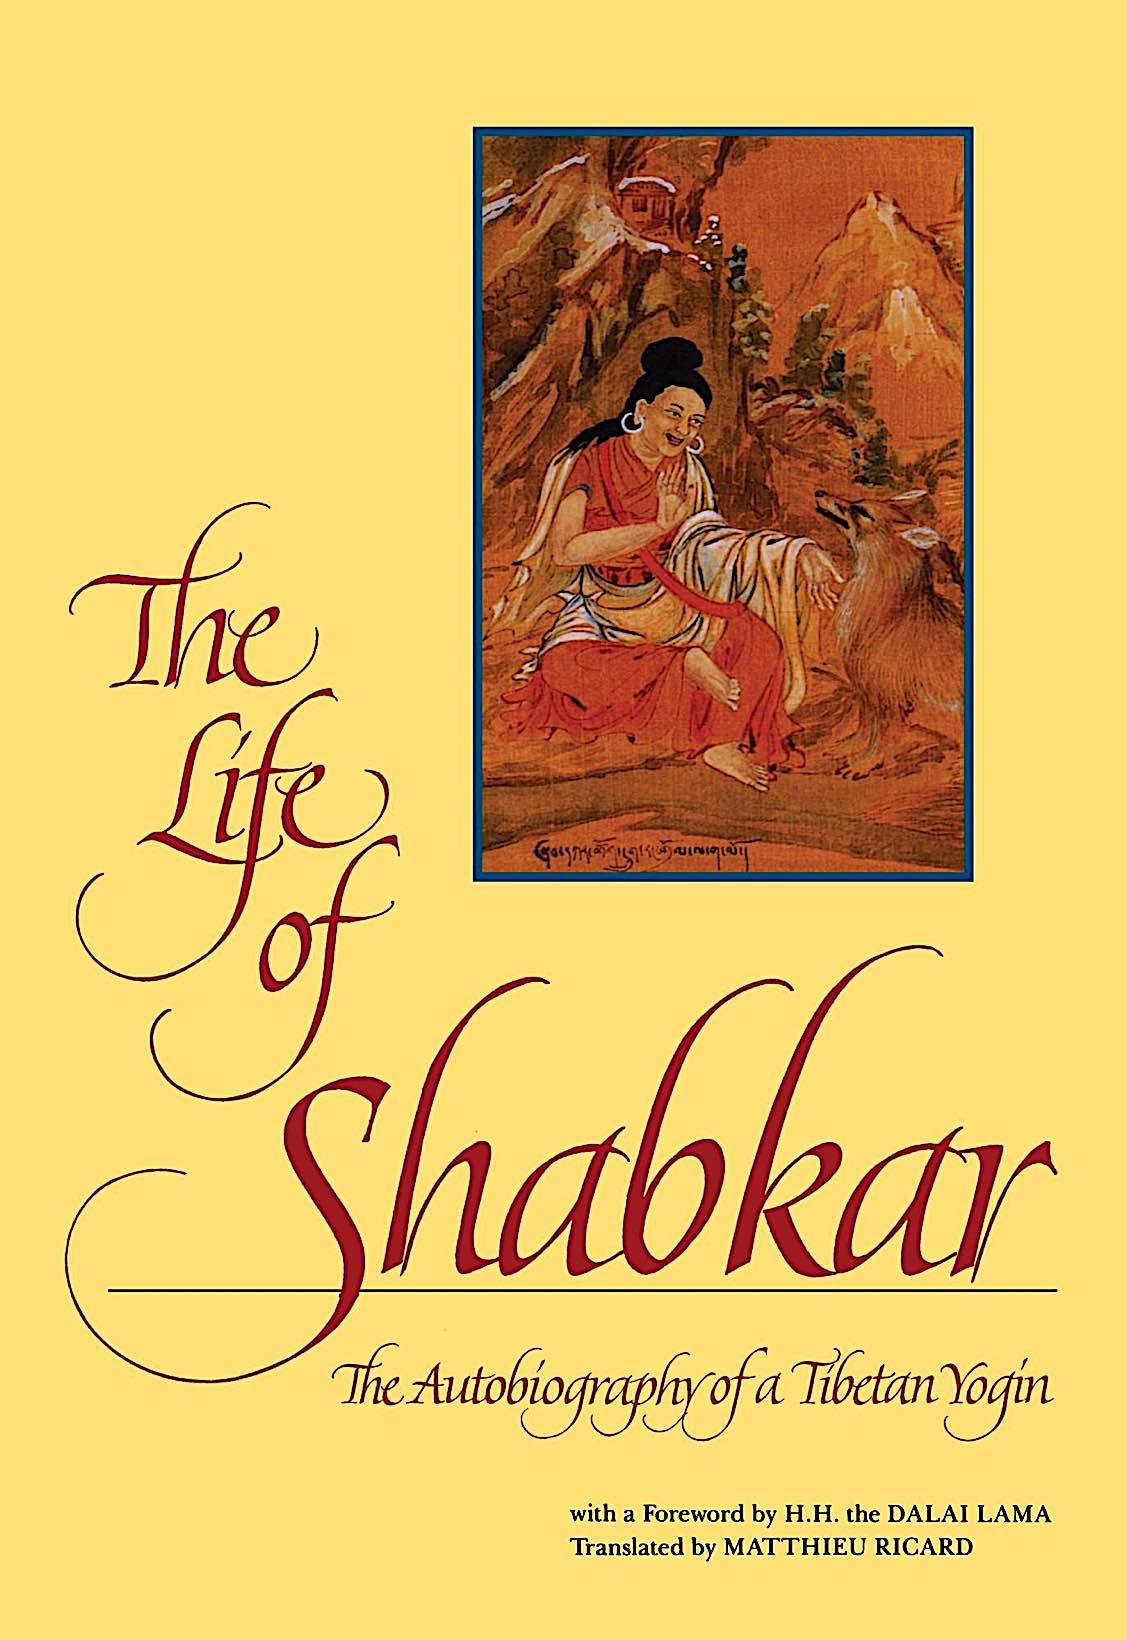 Buddha Weekly Life of Shabkar cover Buddhism